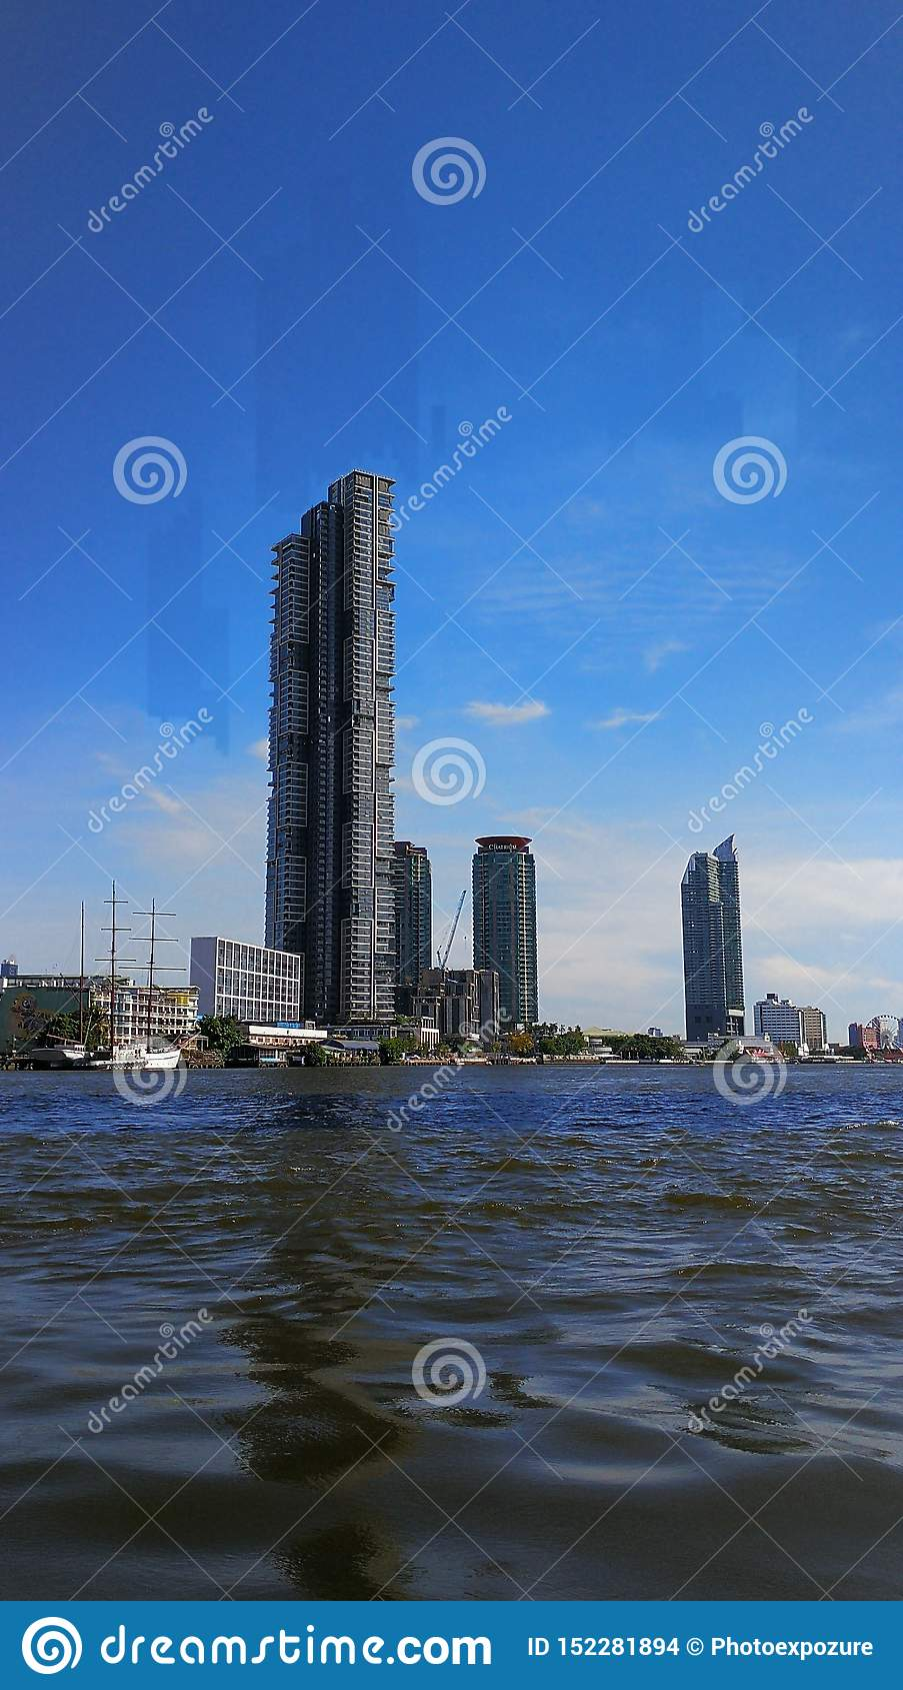 Building in Bangkok Thailand